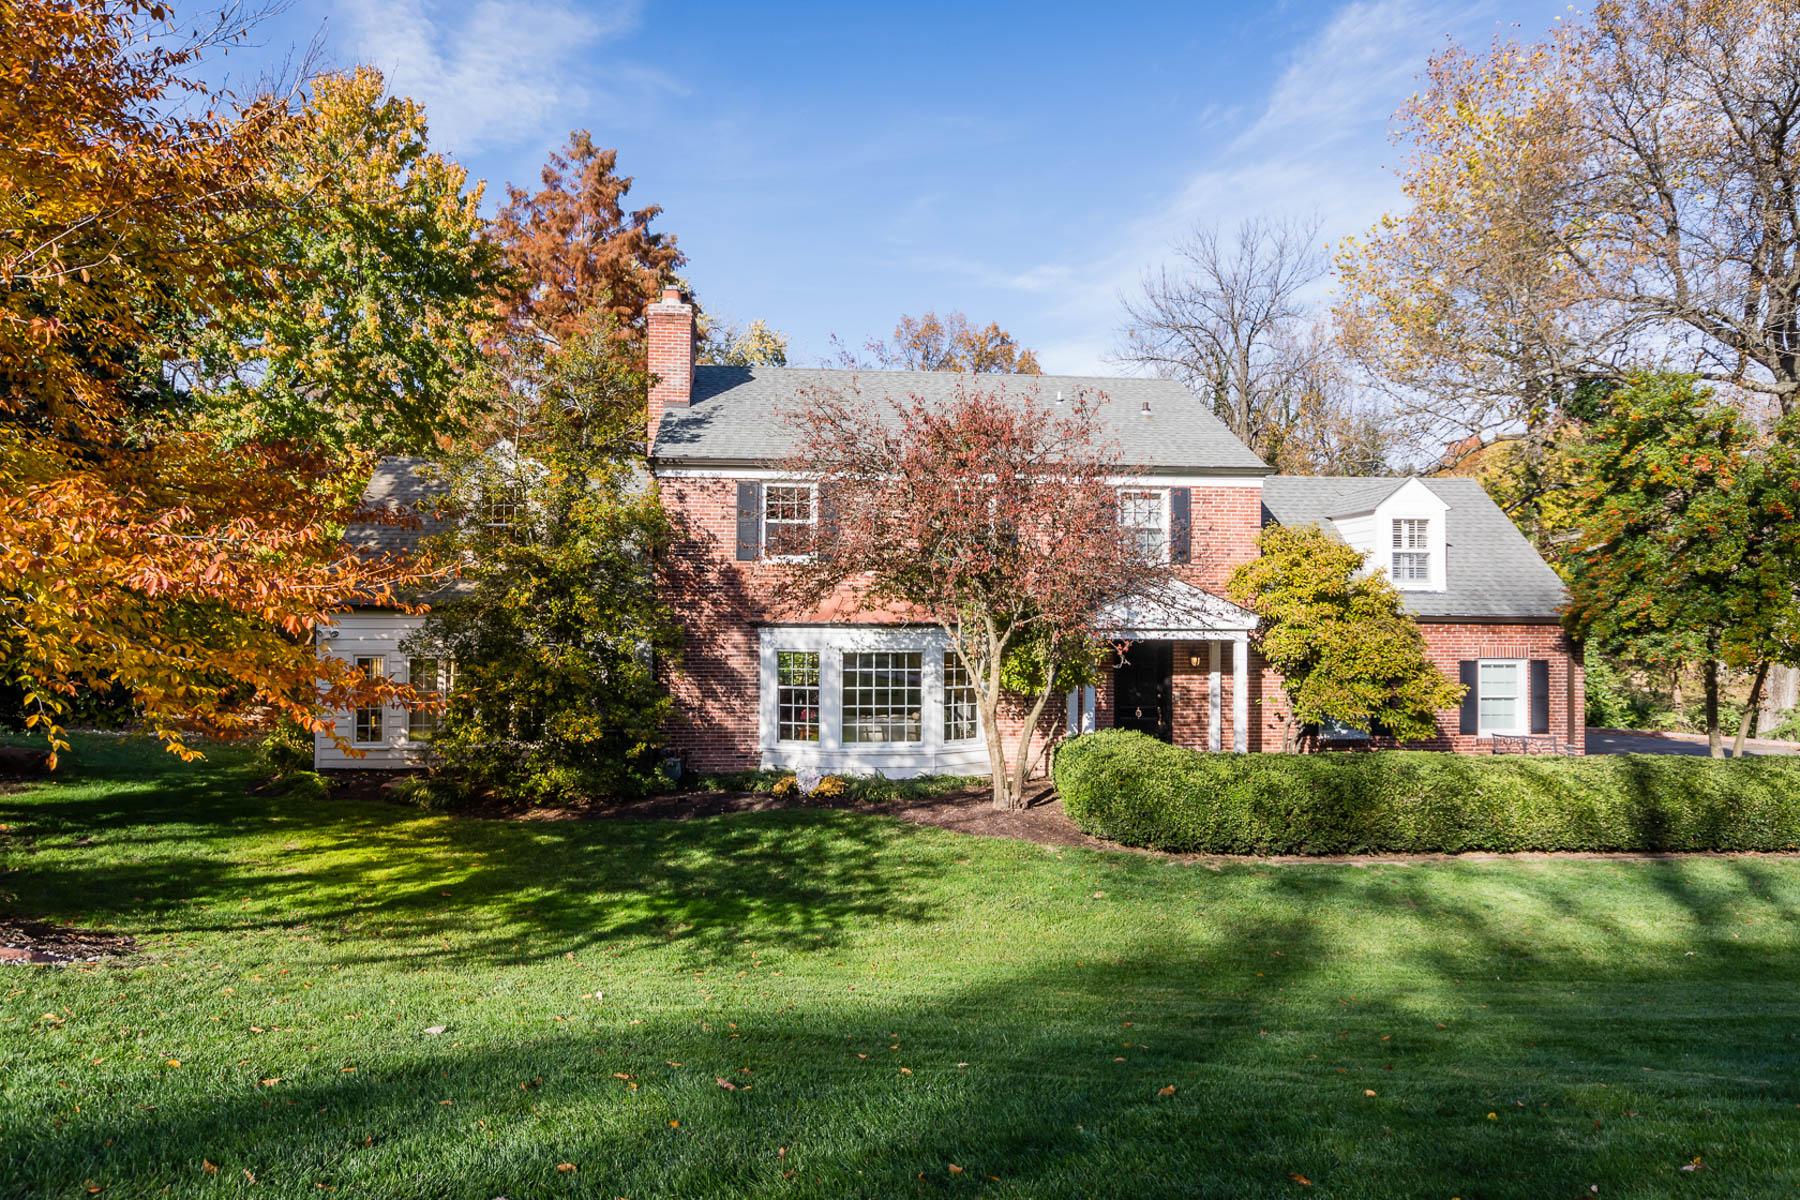 Single Family Home for Sale at Oakleigh Lane 27 Oakleigh Lane Ladue, Missouri, 63124 United States